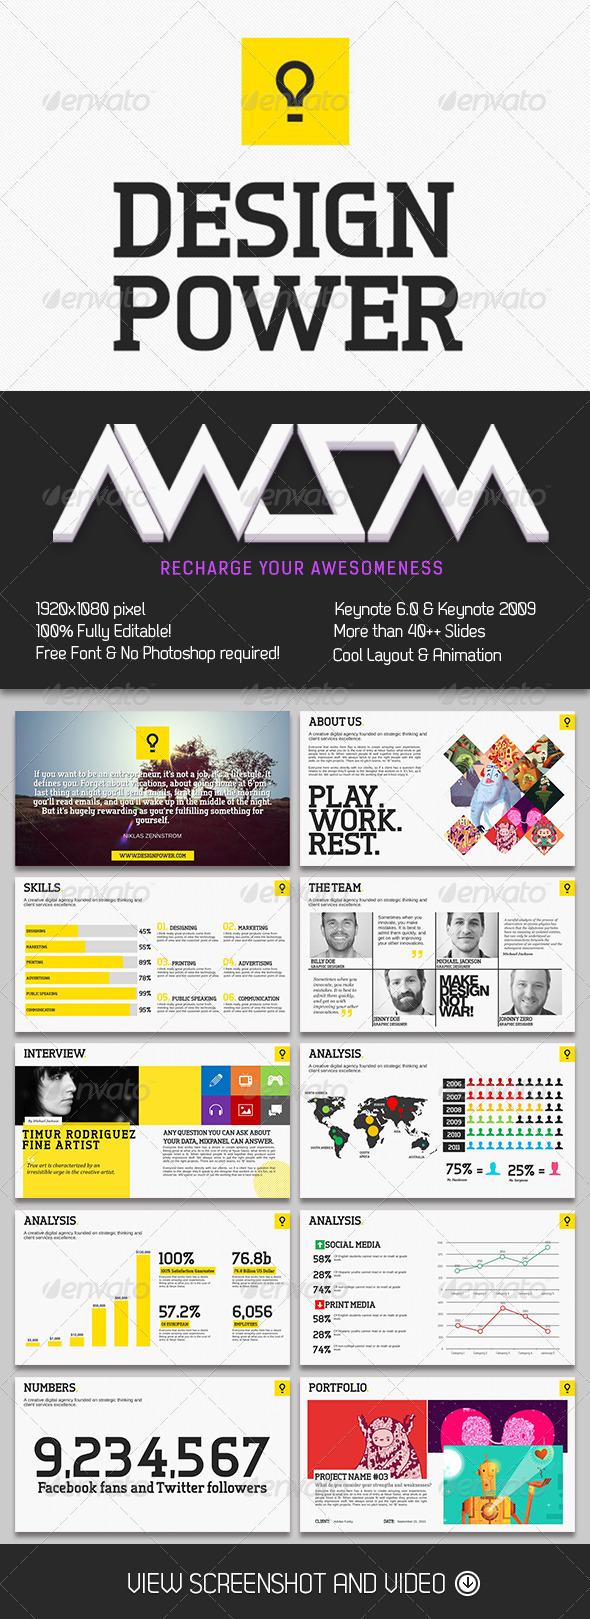 GraphicRiver Design Power Keynote Template 6572178